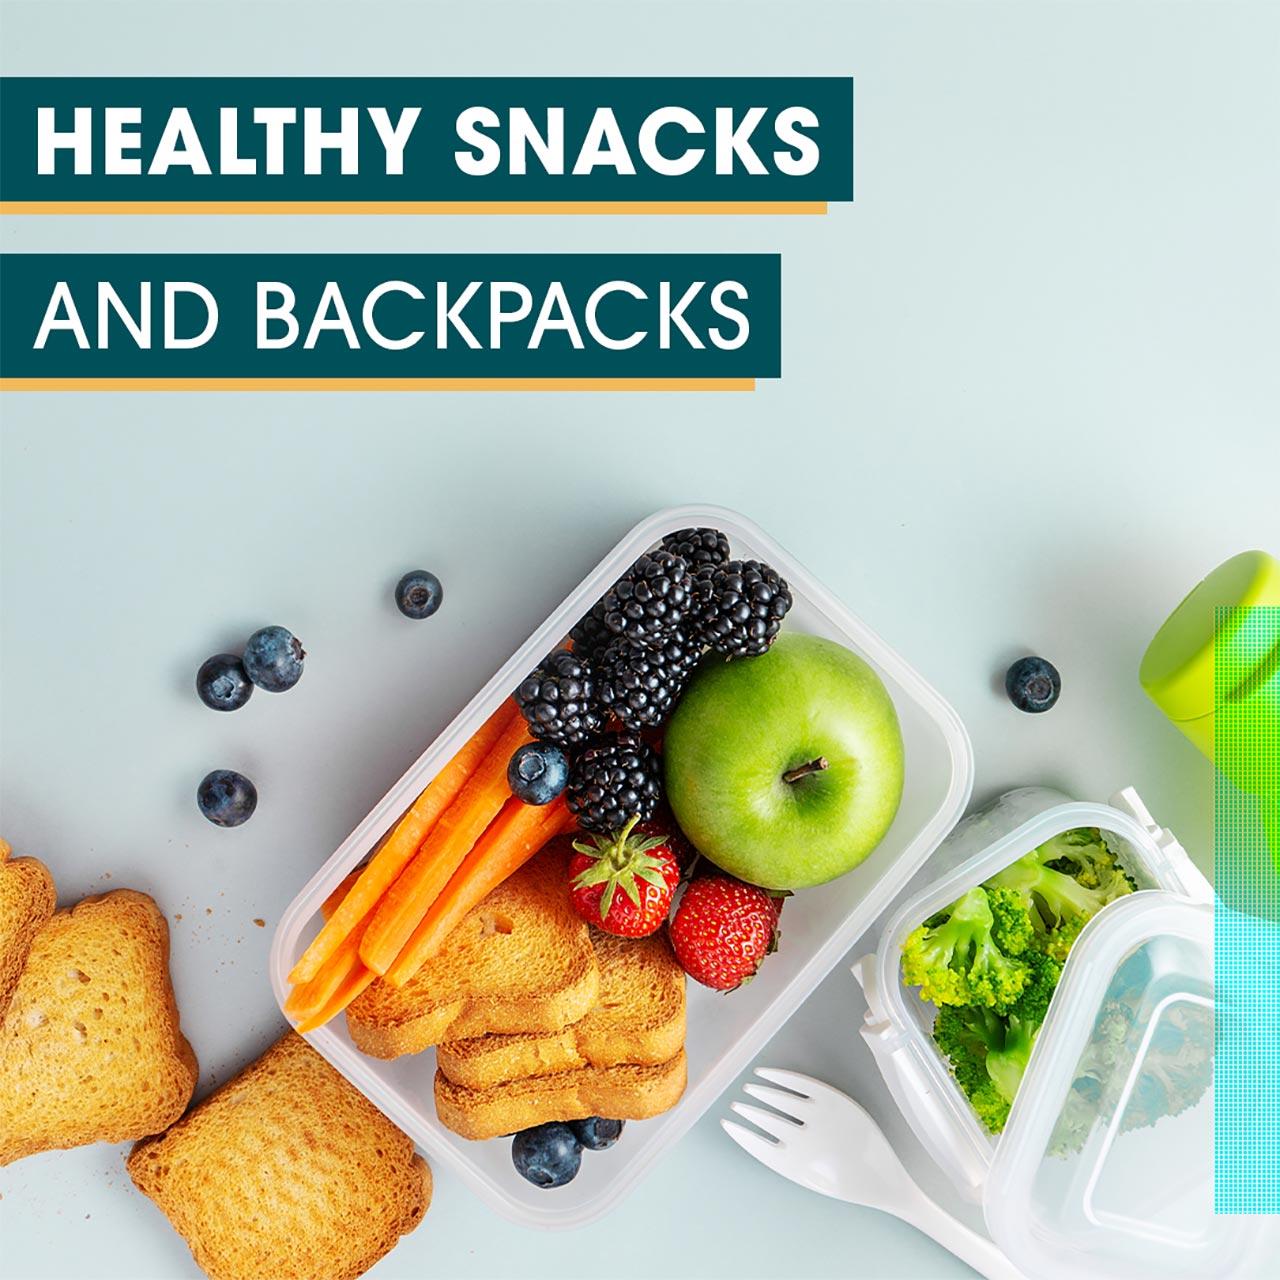 Health Snacks and Backpacks